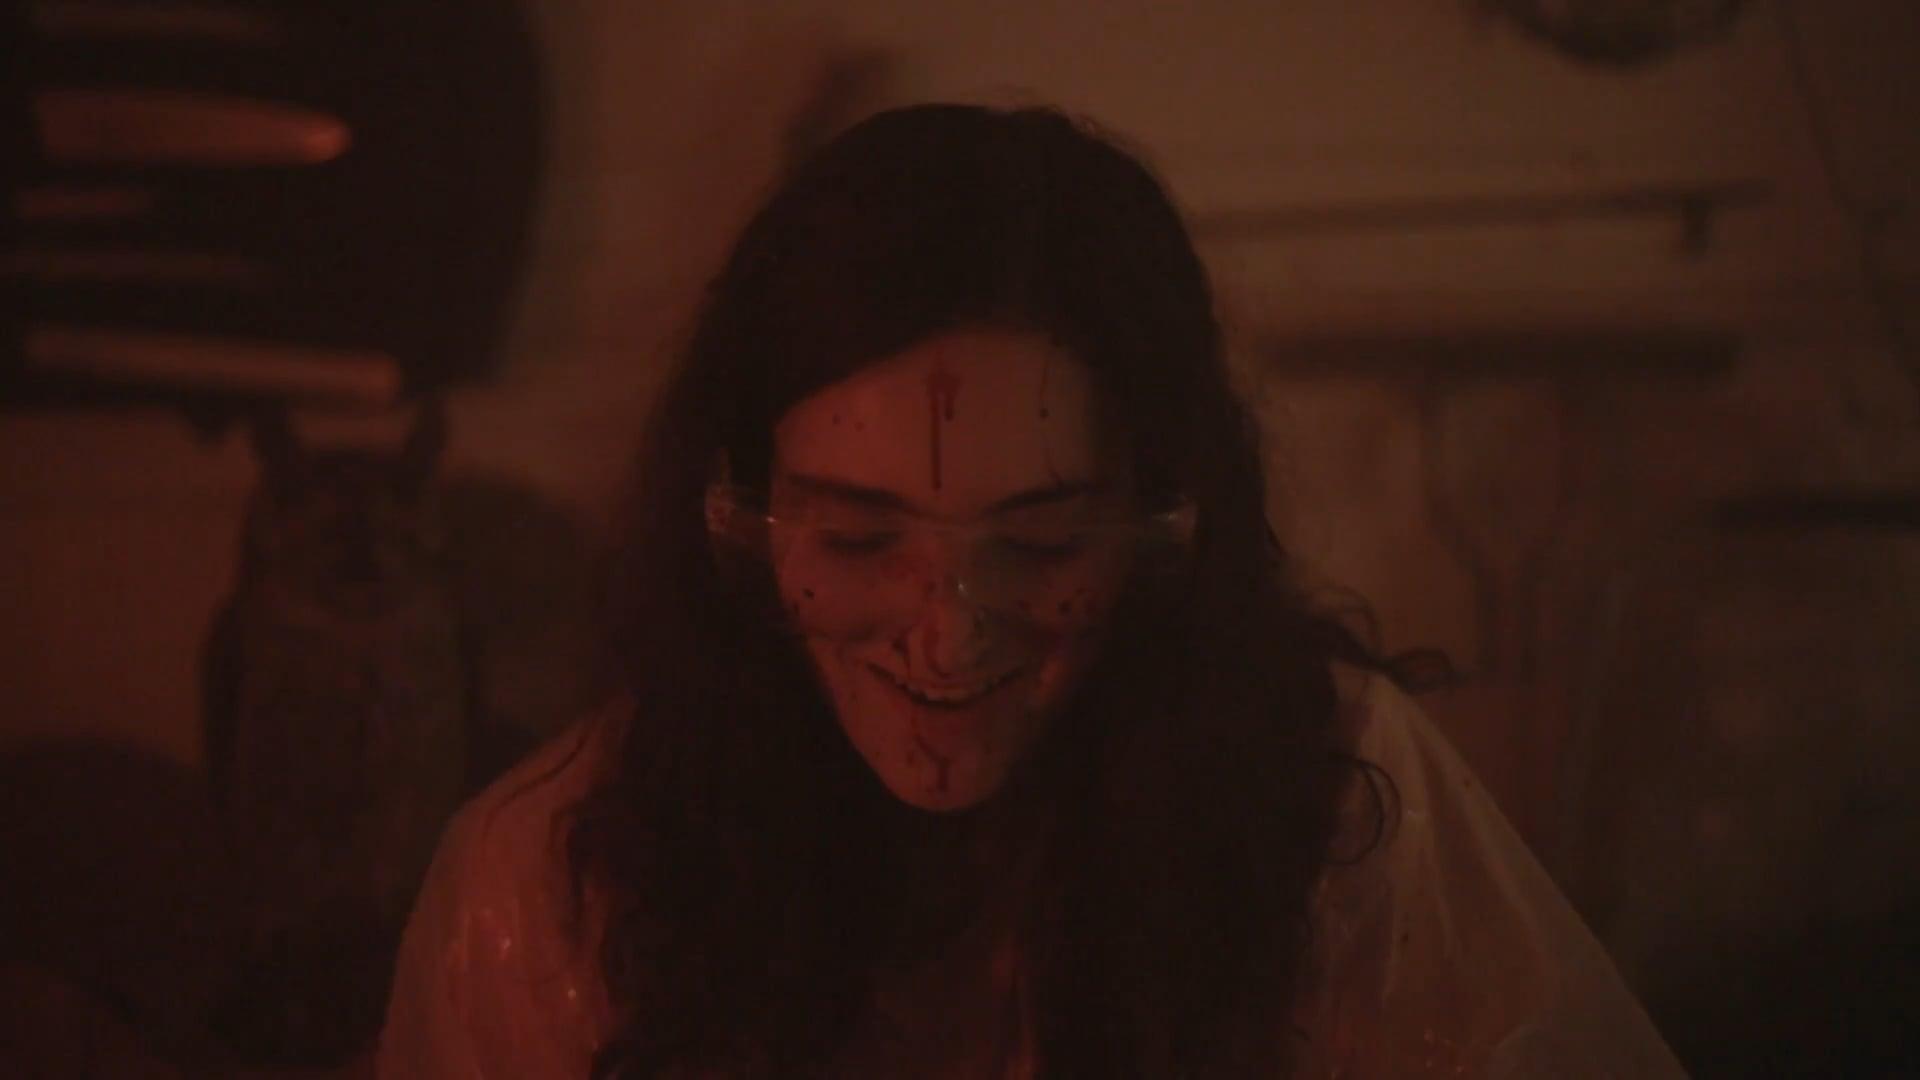 Blood Ties, Comedy Horror 1 Min Short Film